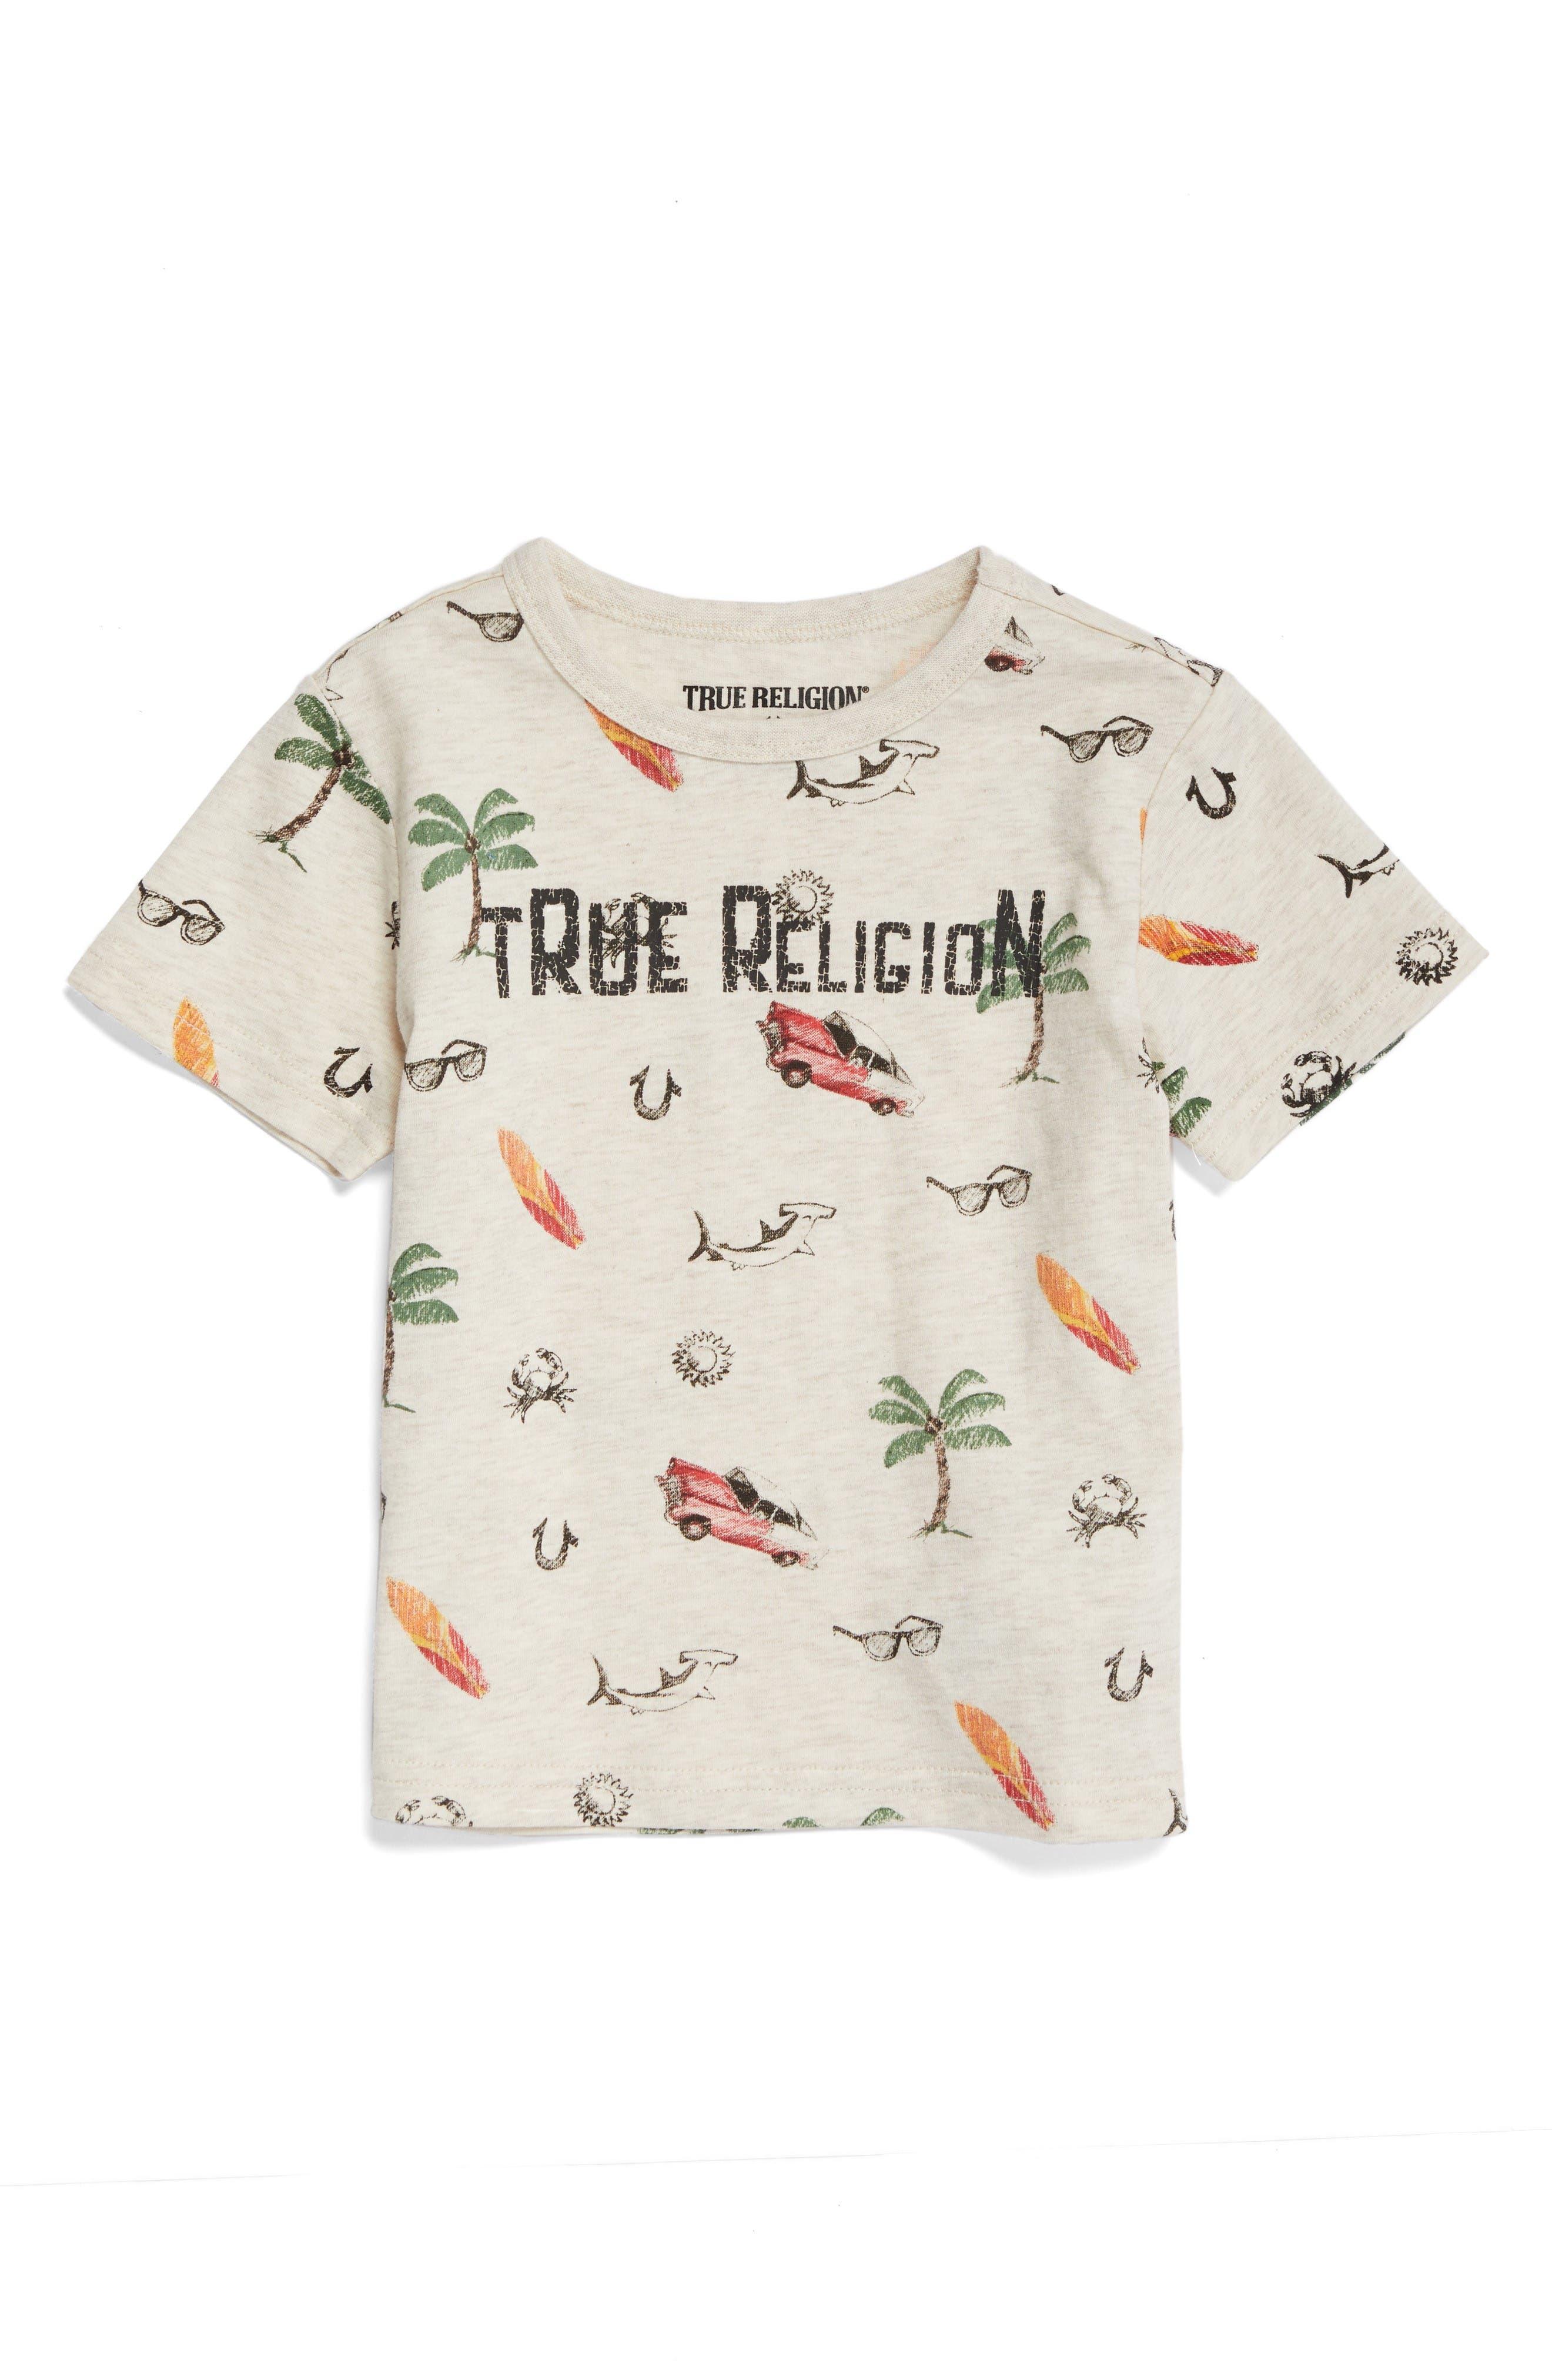 Main Image - True Religion Retro Doodle T-Shirt (Baby)